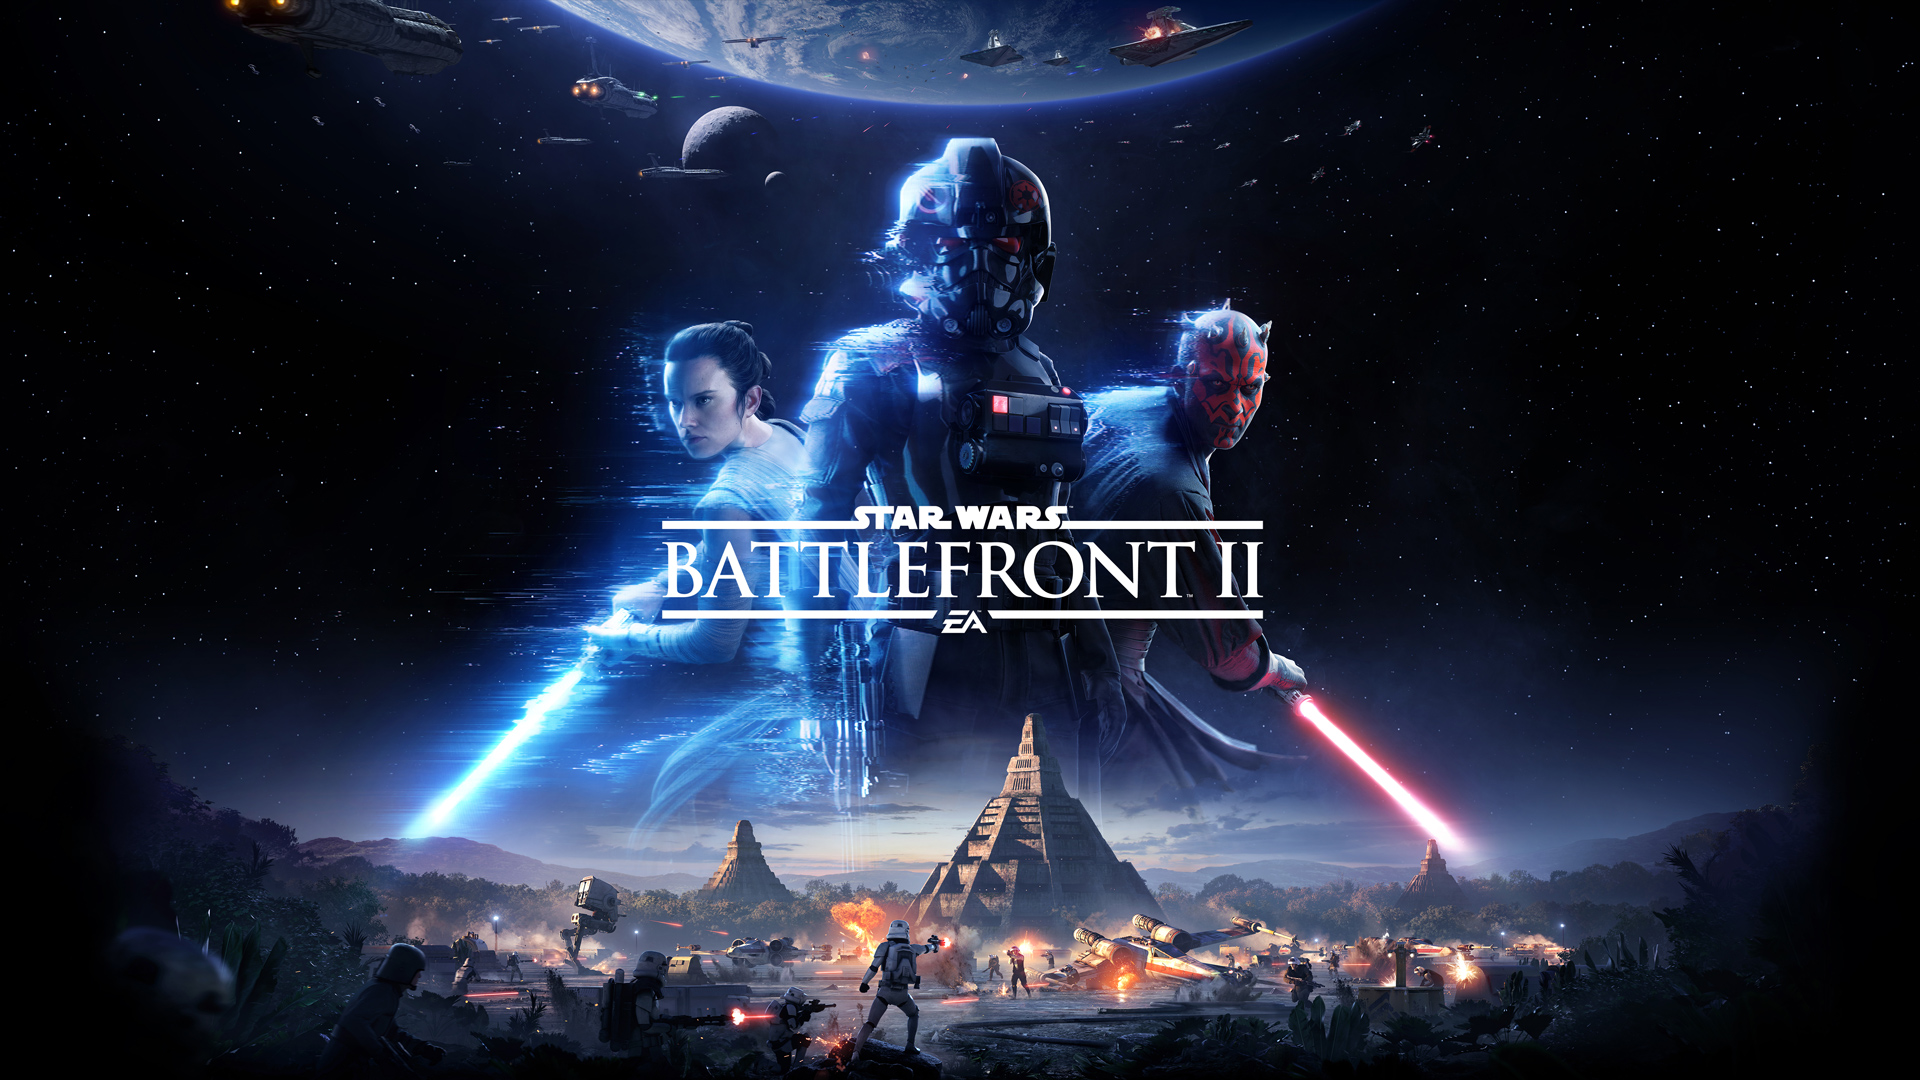 Star Wars Battlefront II La bande annonce entière